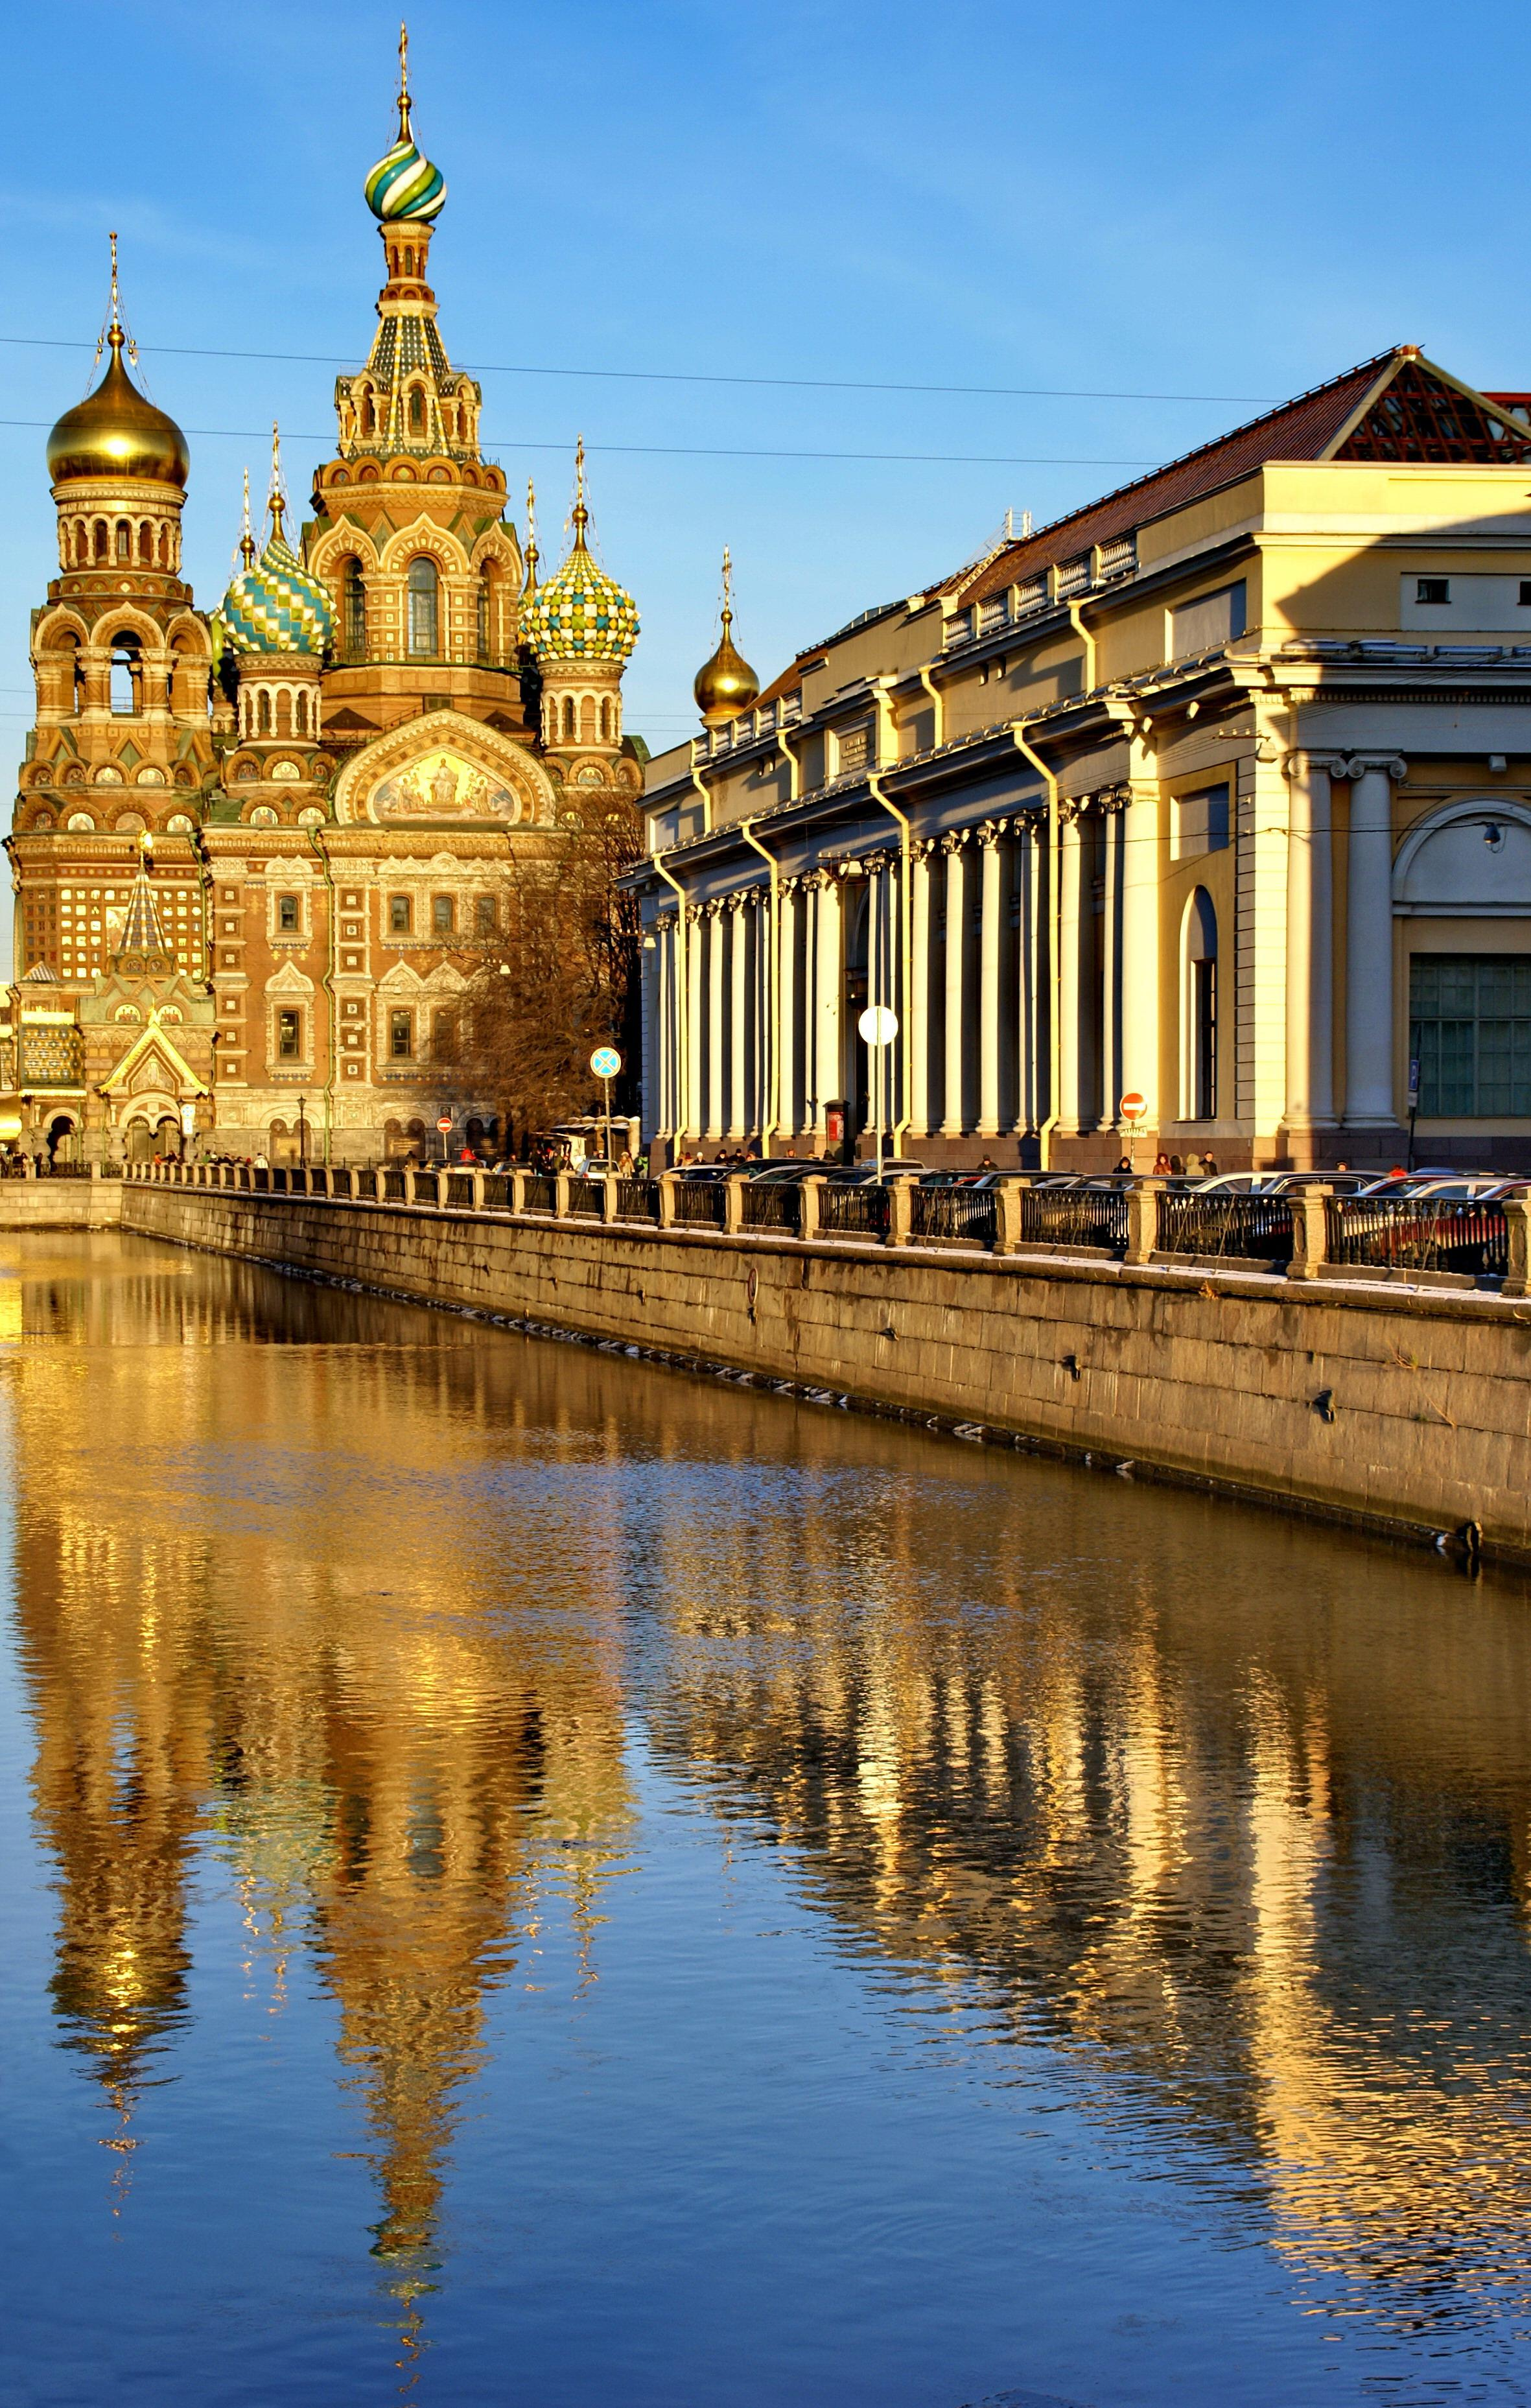 saint Petersbourg Russie visiter canal griboedov spas na krovi inoubliables nuit blanche